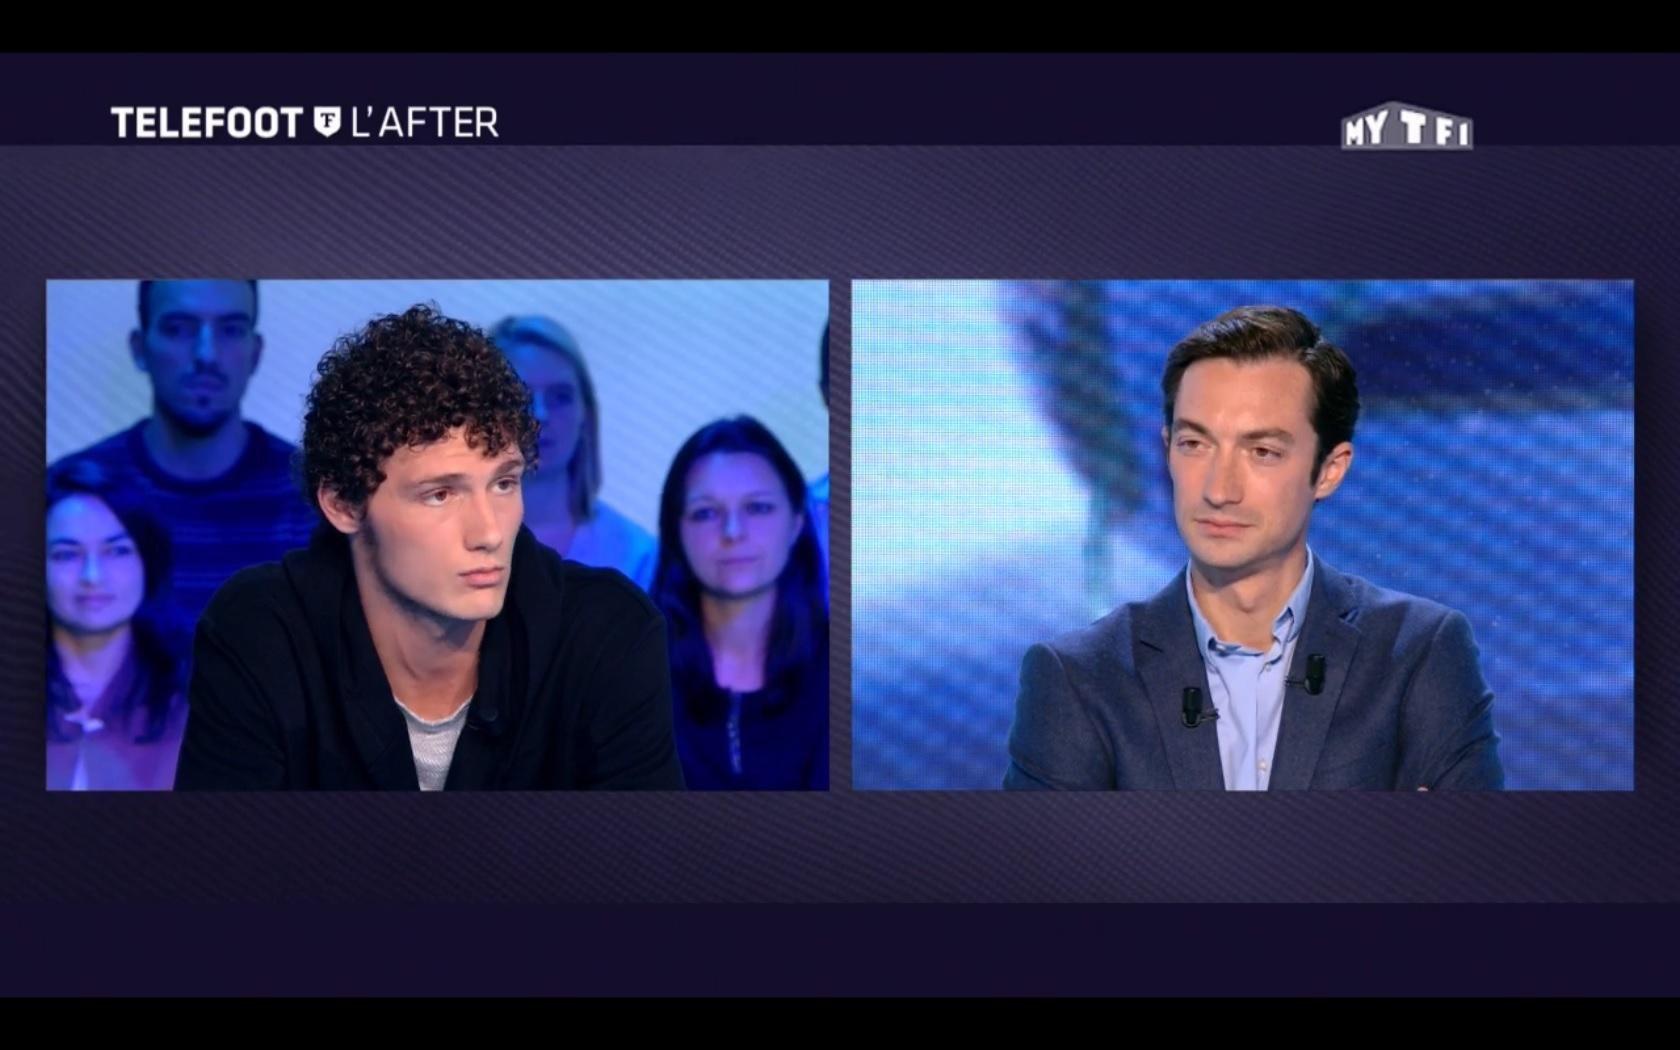 TF1 TÉLÉCHARGER TELEFOOT